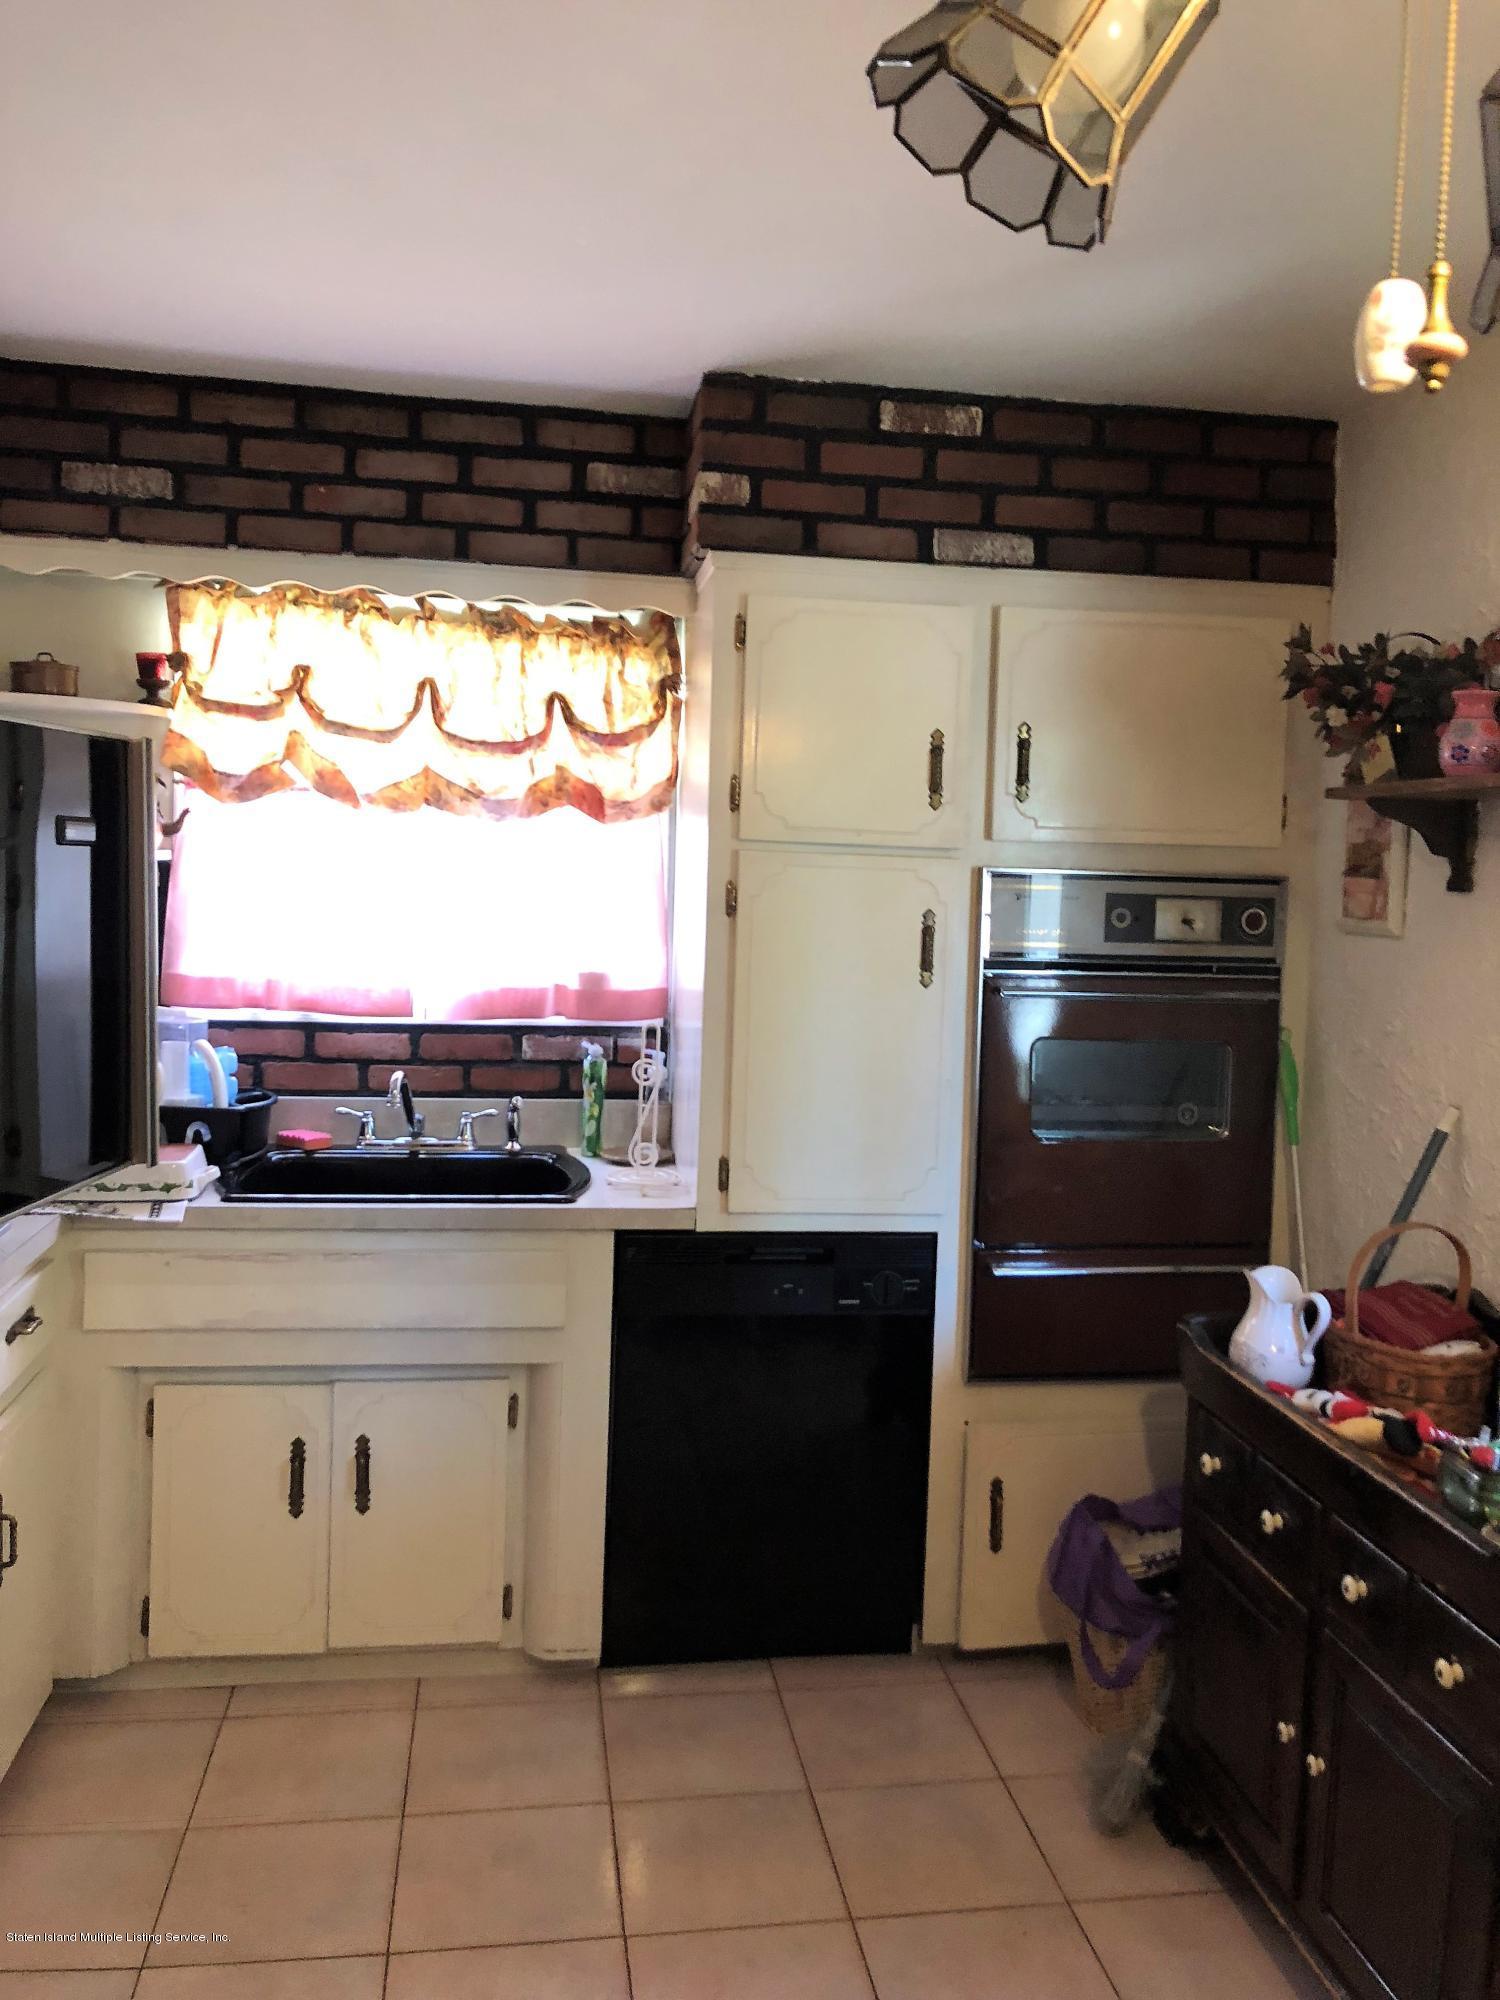 Single Family - Semi-Attached 67 Cranford Street  Staten Island, NY 10308, MLS-1130182-6